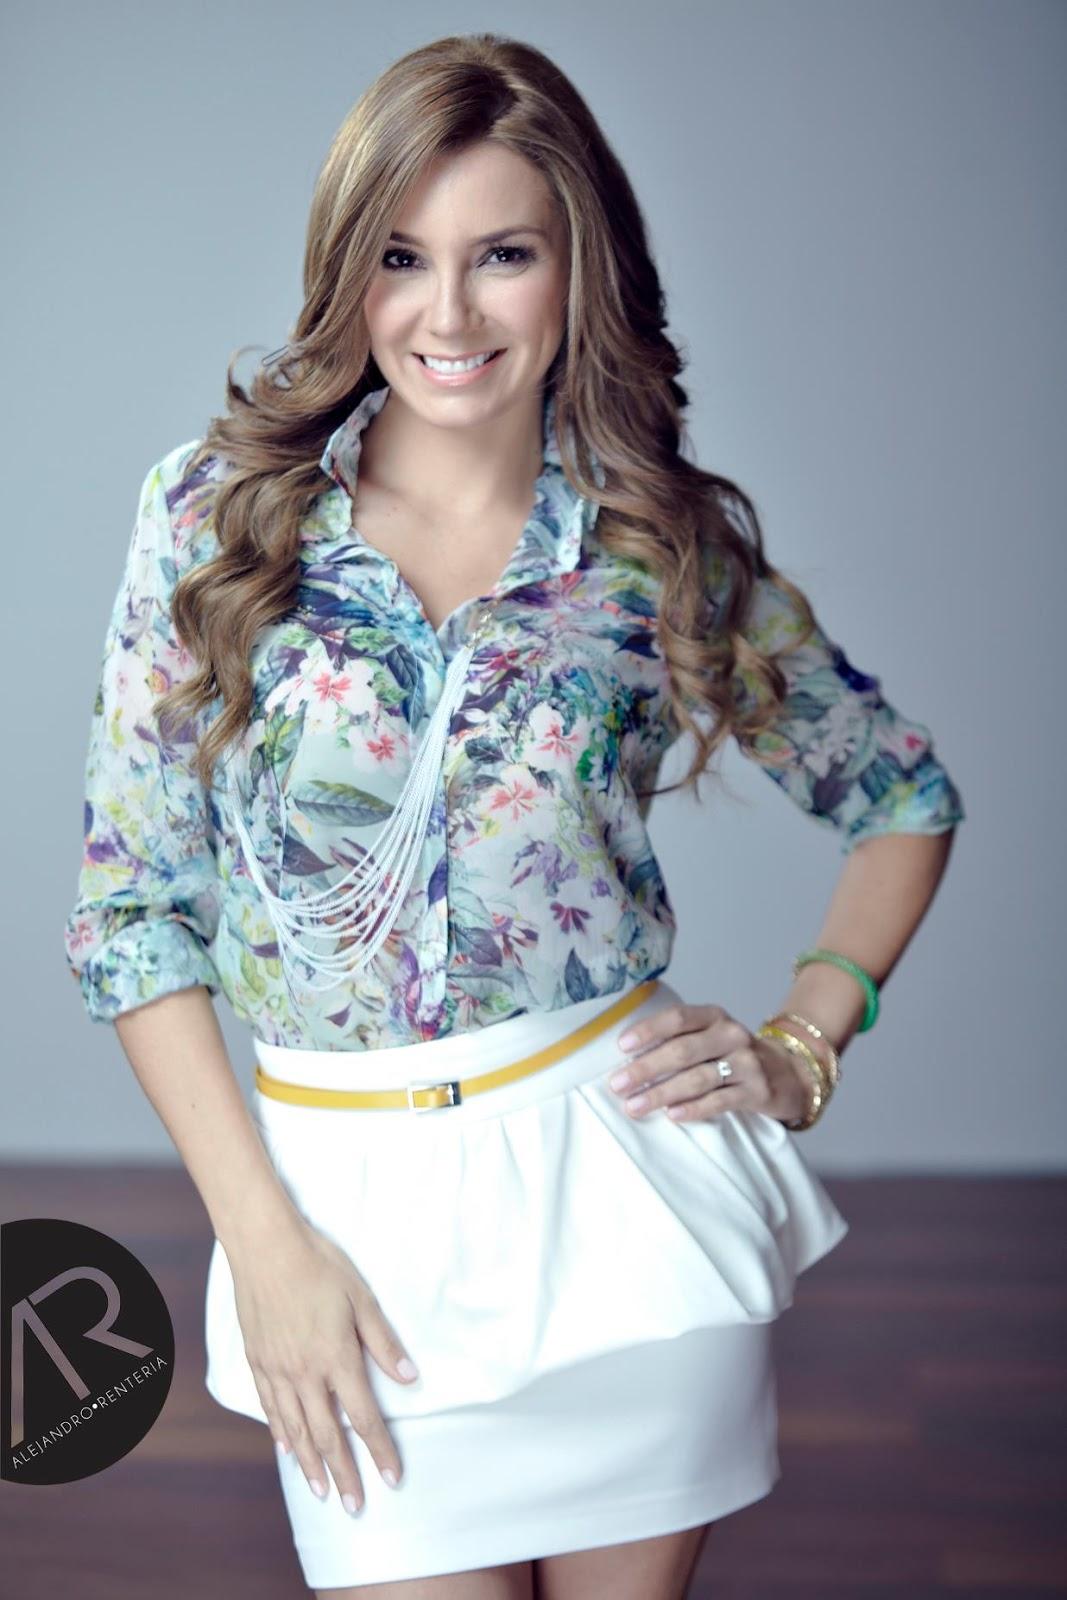 elizabeth gutierrez - photo #18